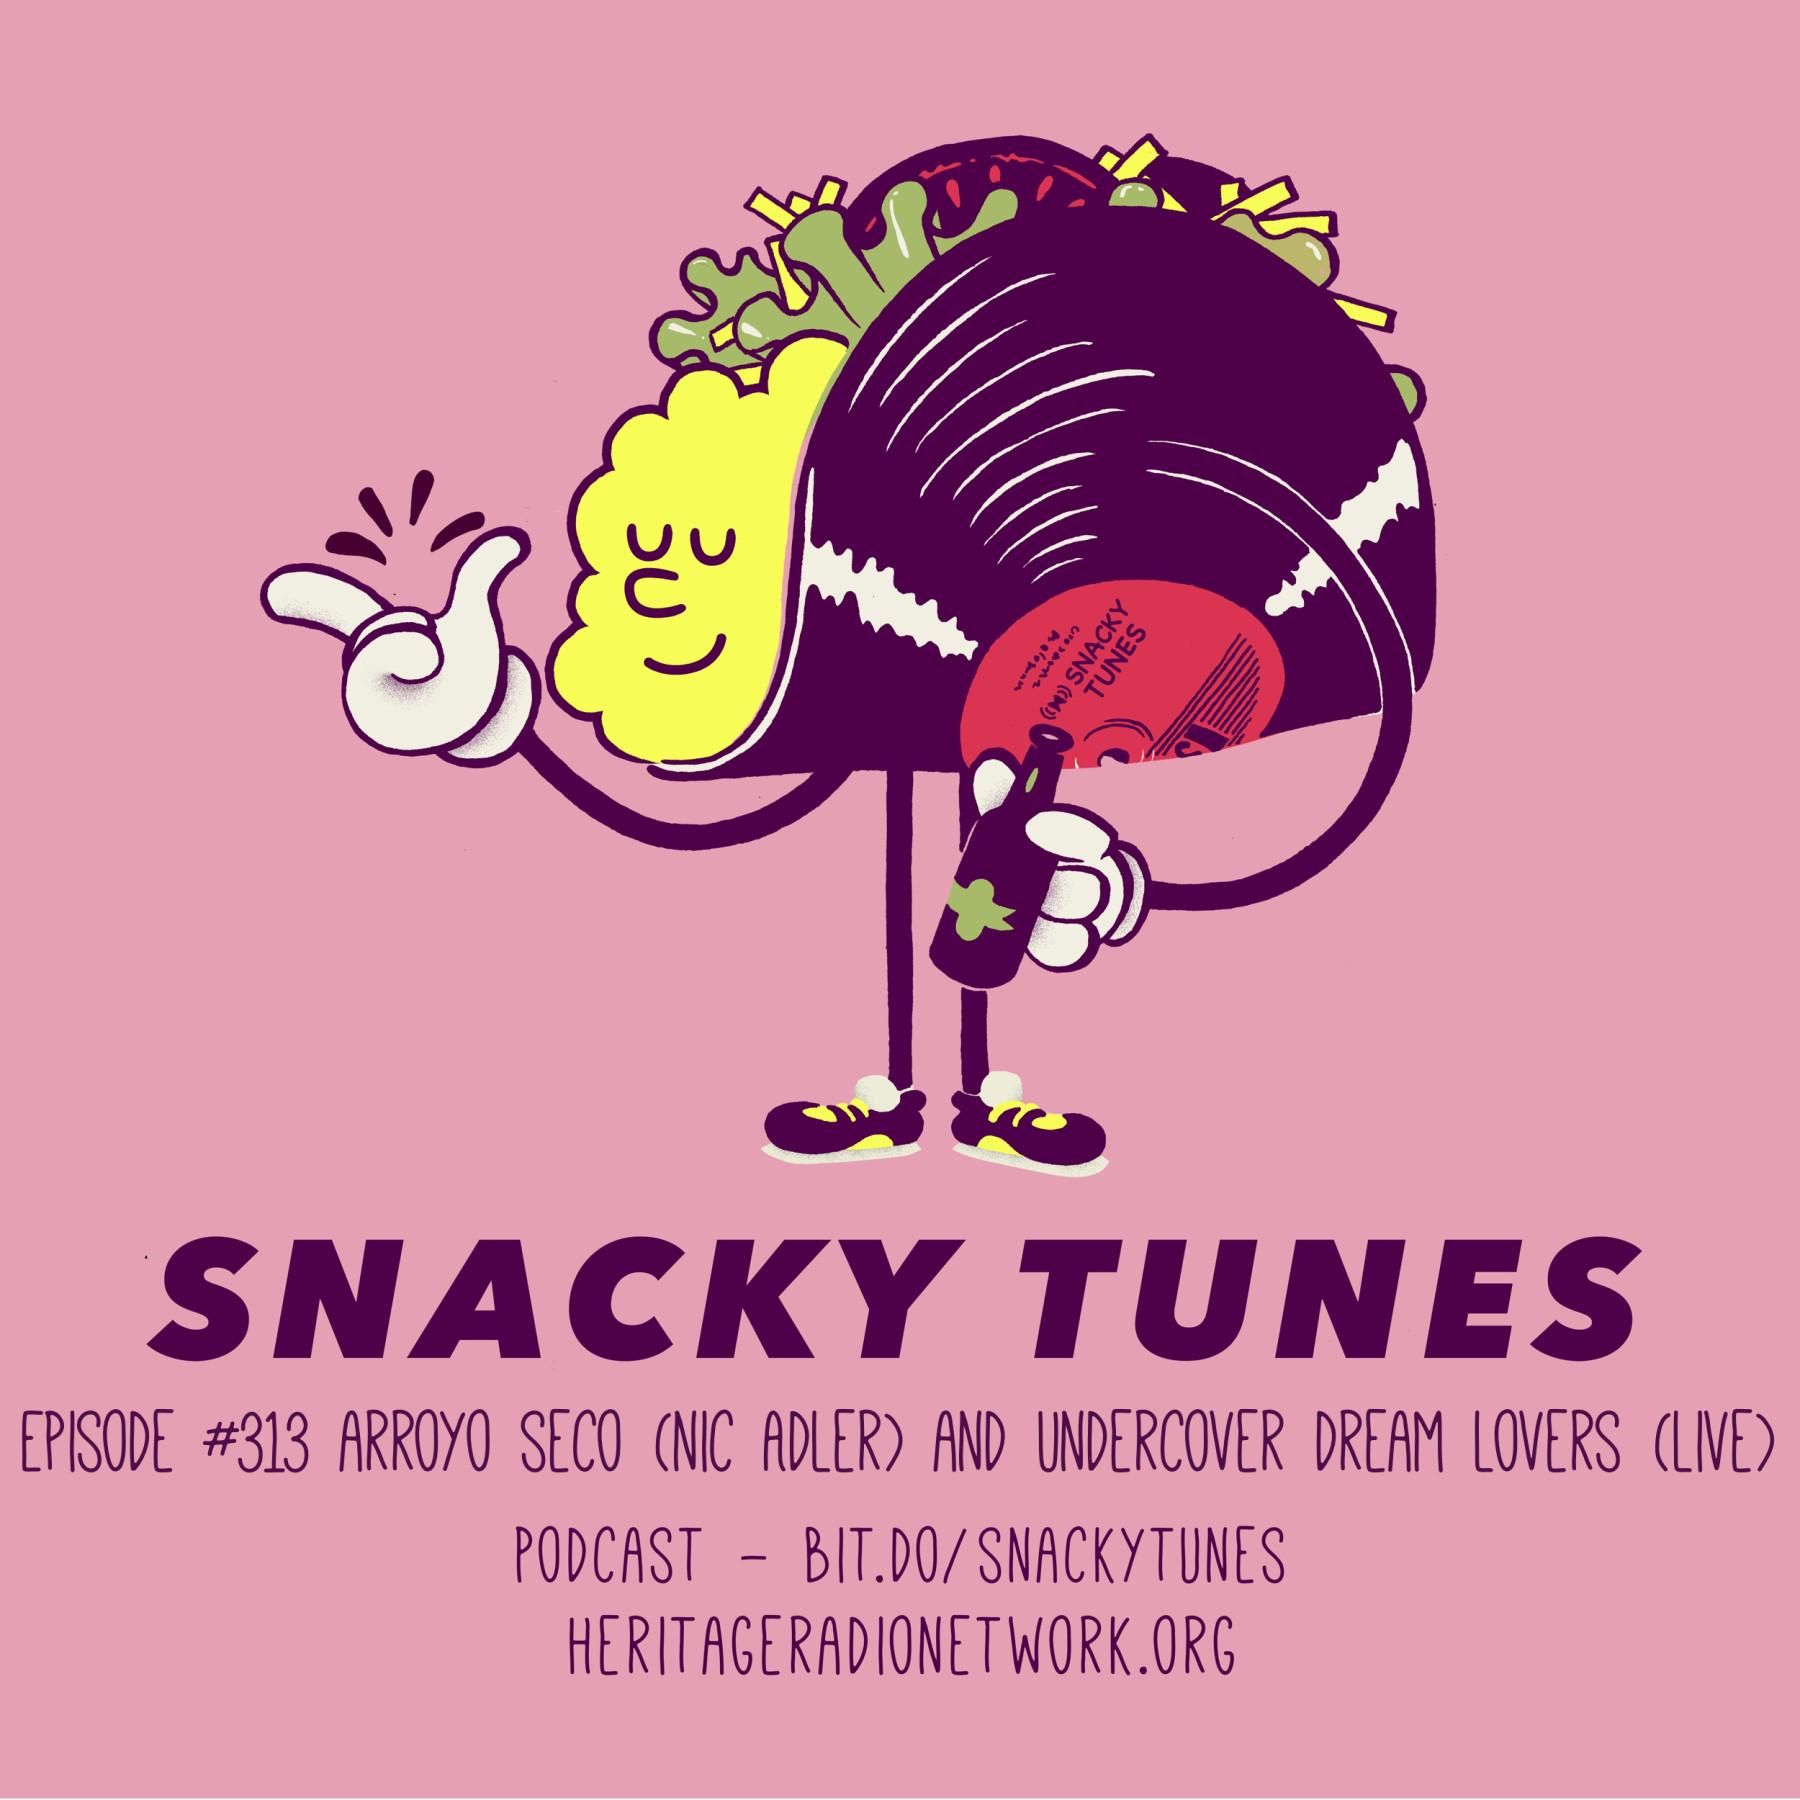 Snacky_Tunes-Podacst_Editable_313.001